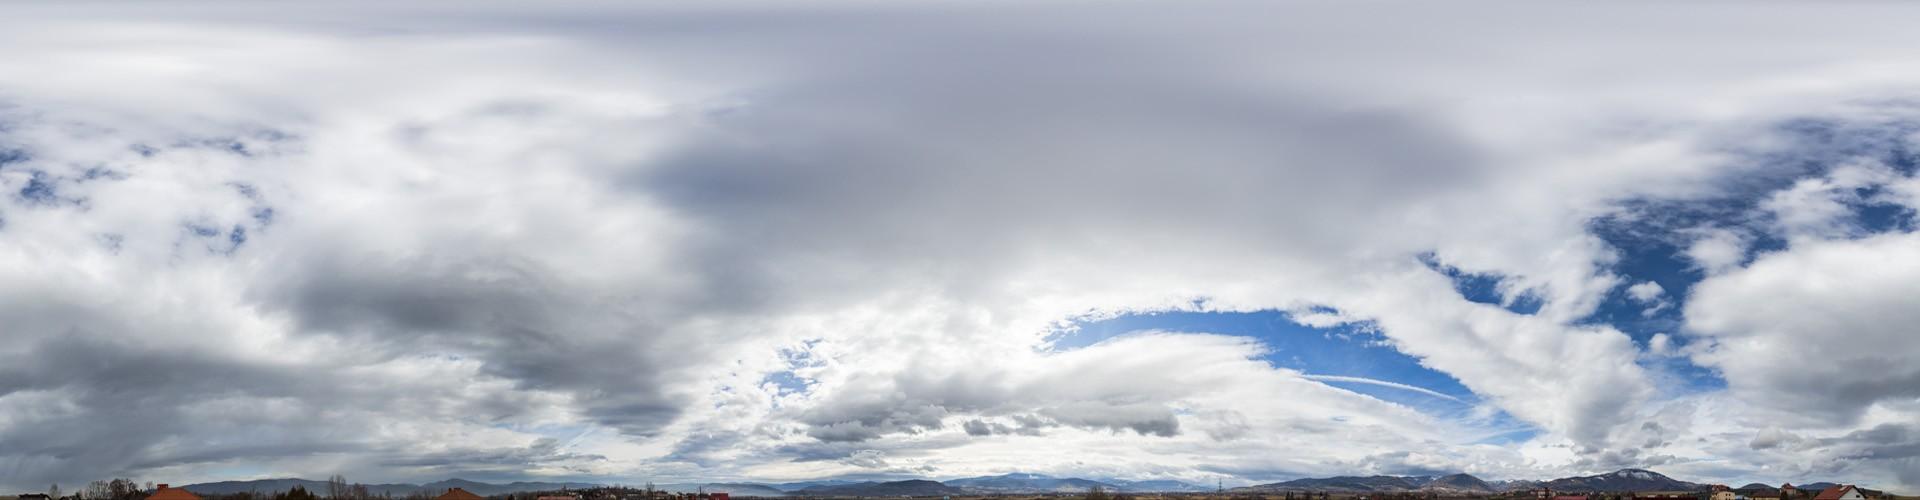 Cloudy Mountains 8734 (30k)